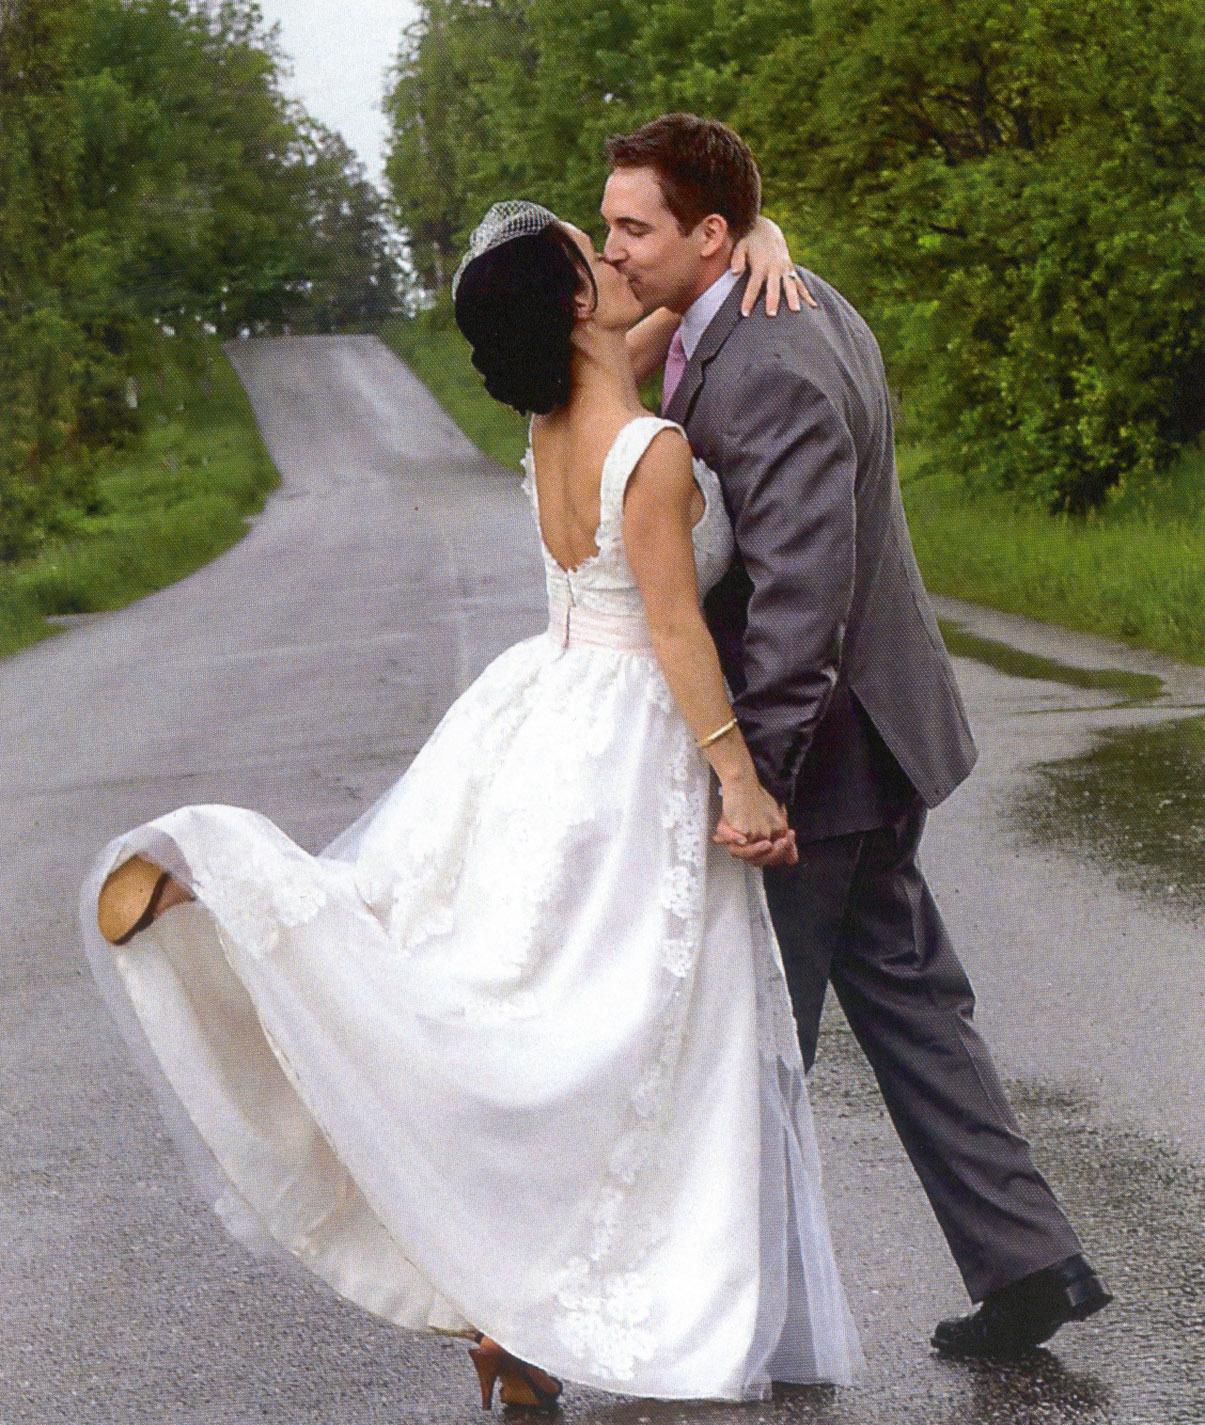 Lindsay and groom kiss sq sp.jpg